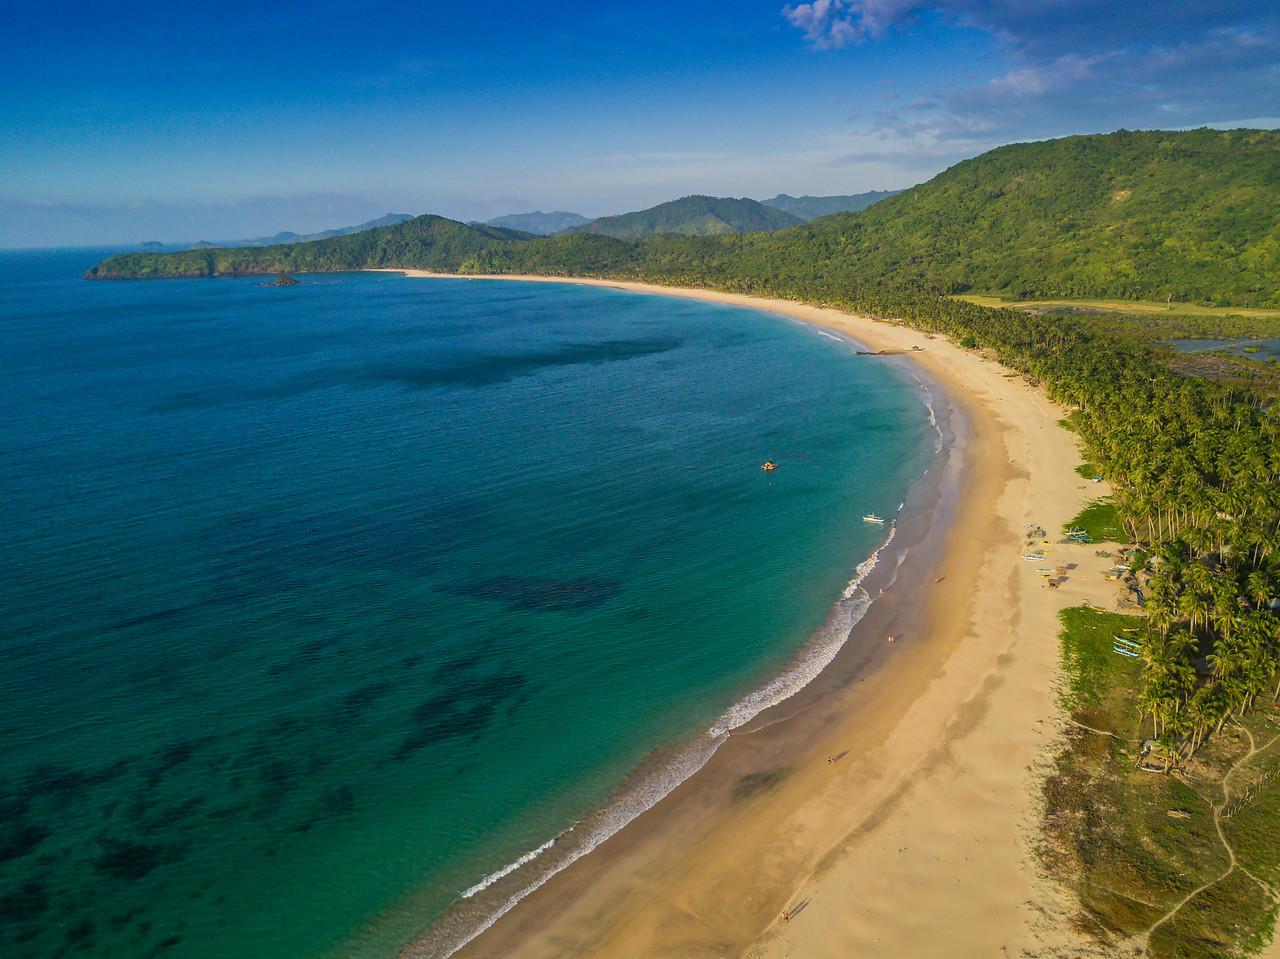 El Nido (aerial) - at Nacpan beach